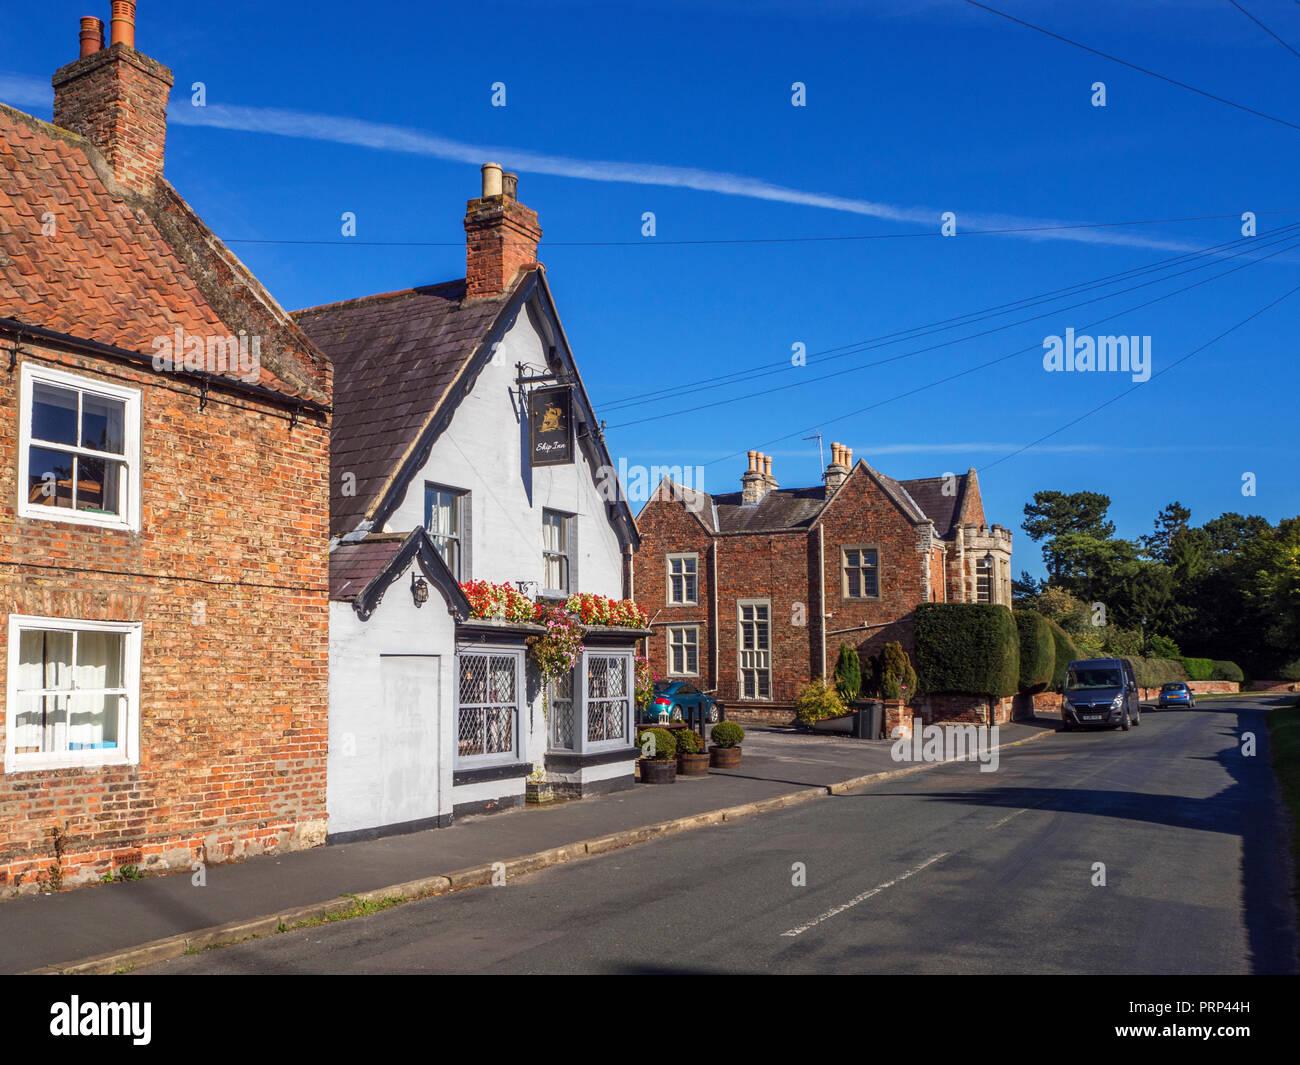 The Ship Inn village pub at Aldborough near Boroughbridge North Yorkshire England - Stock Image